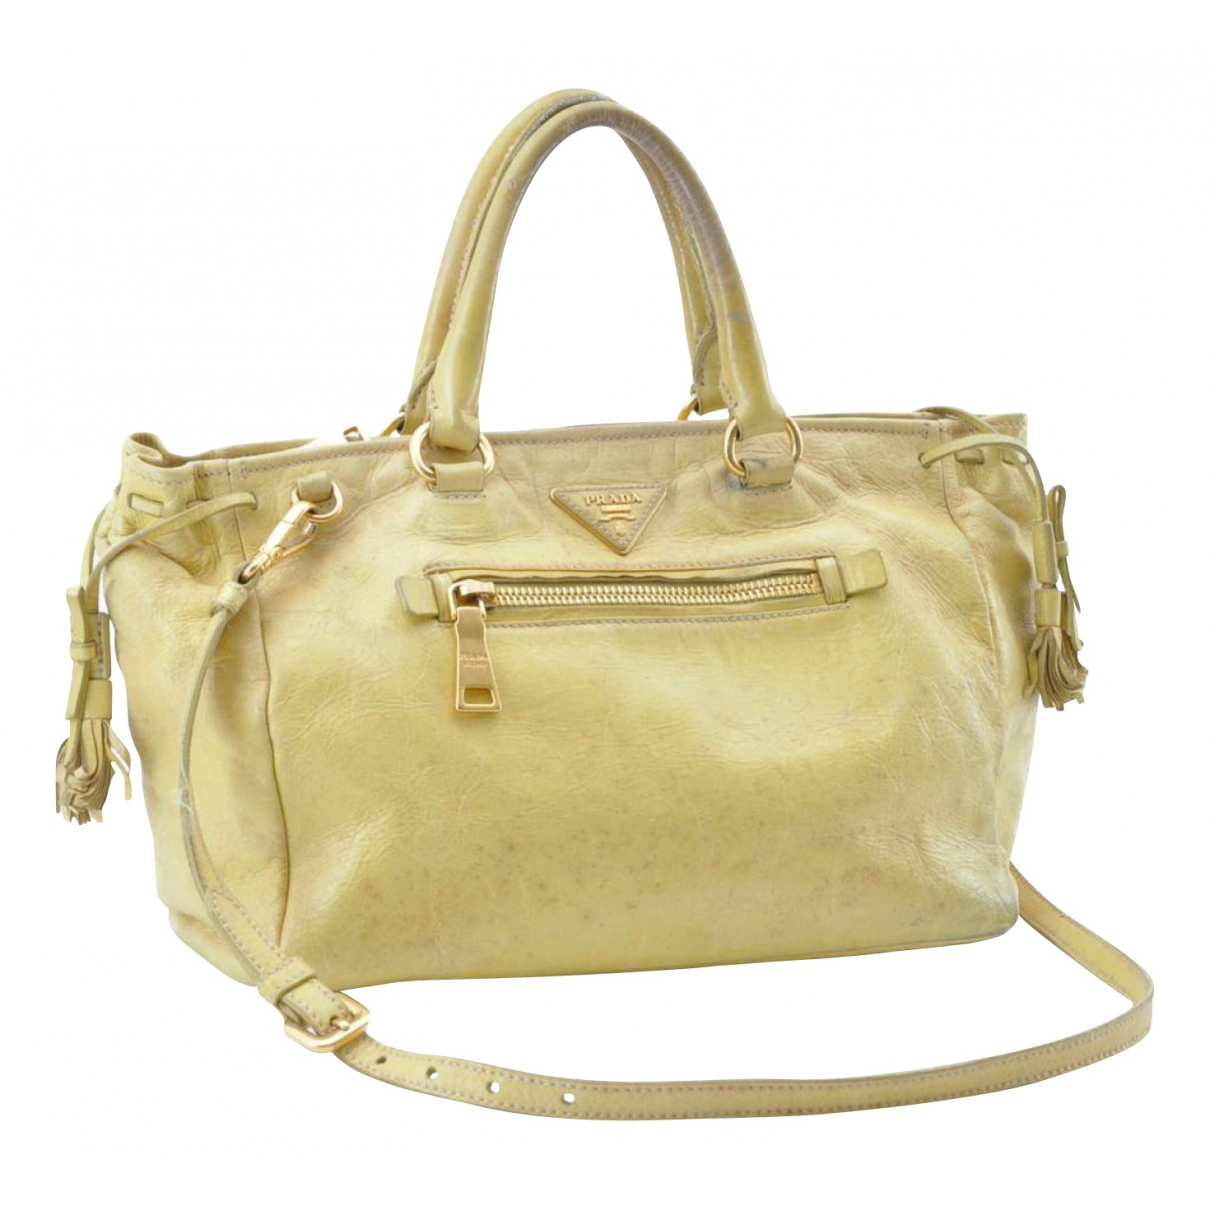 Prada N Yellow Leather handbag for Women N